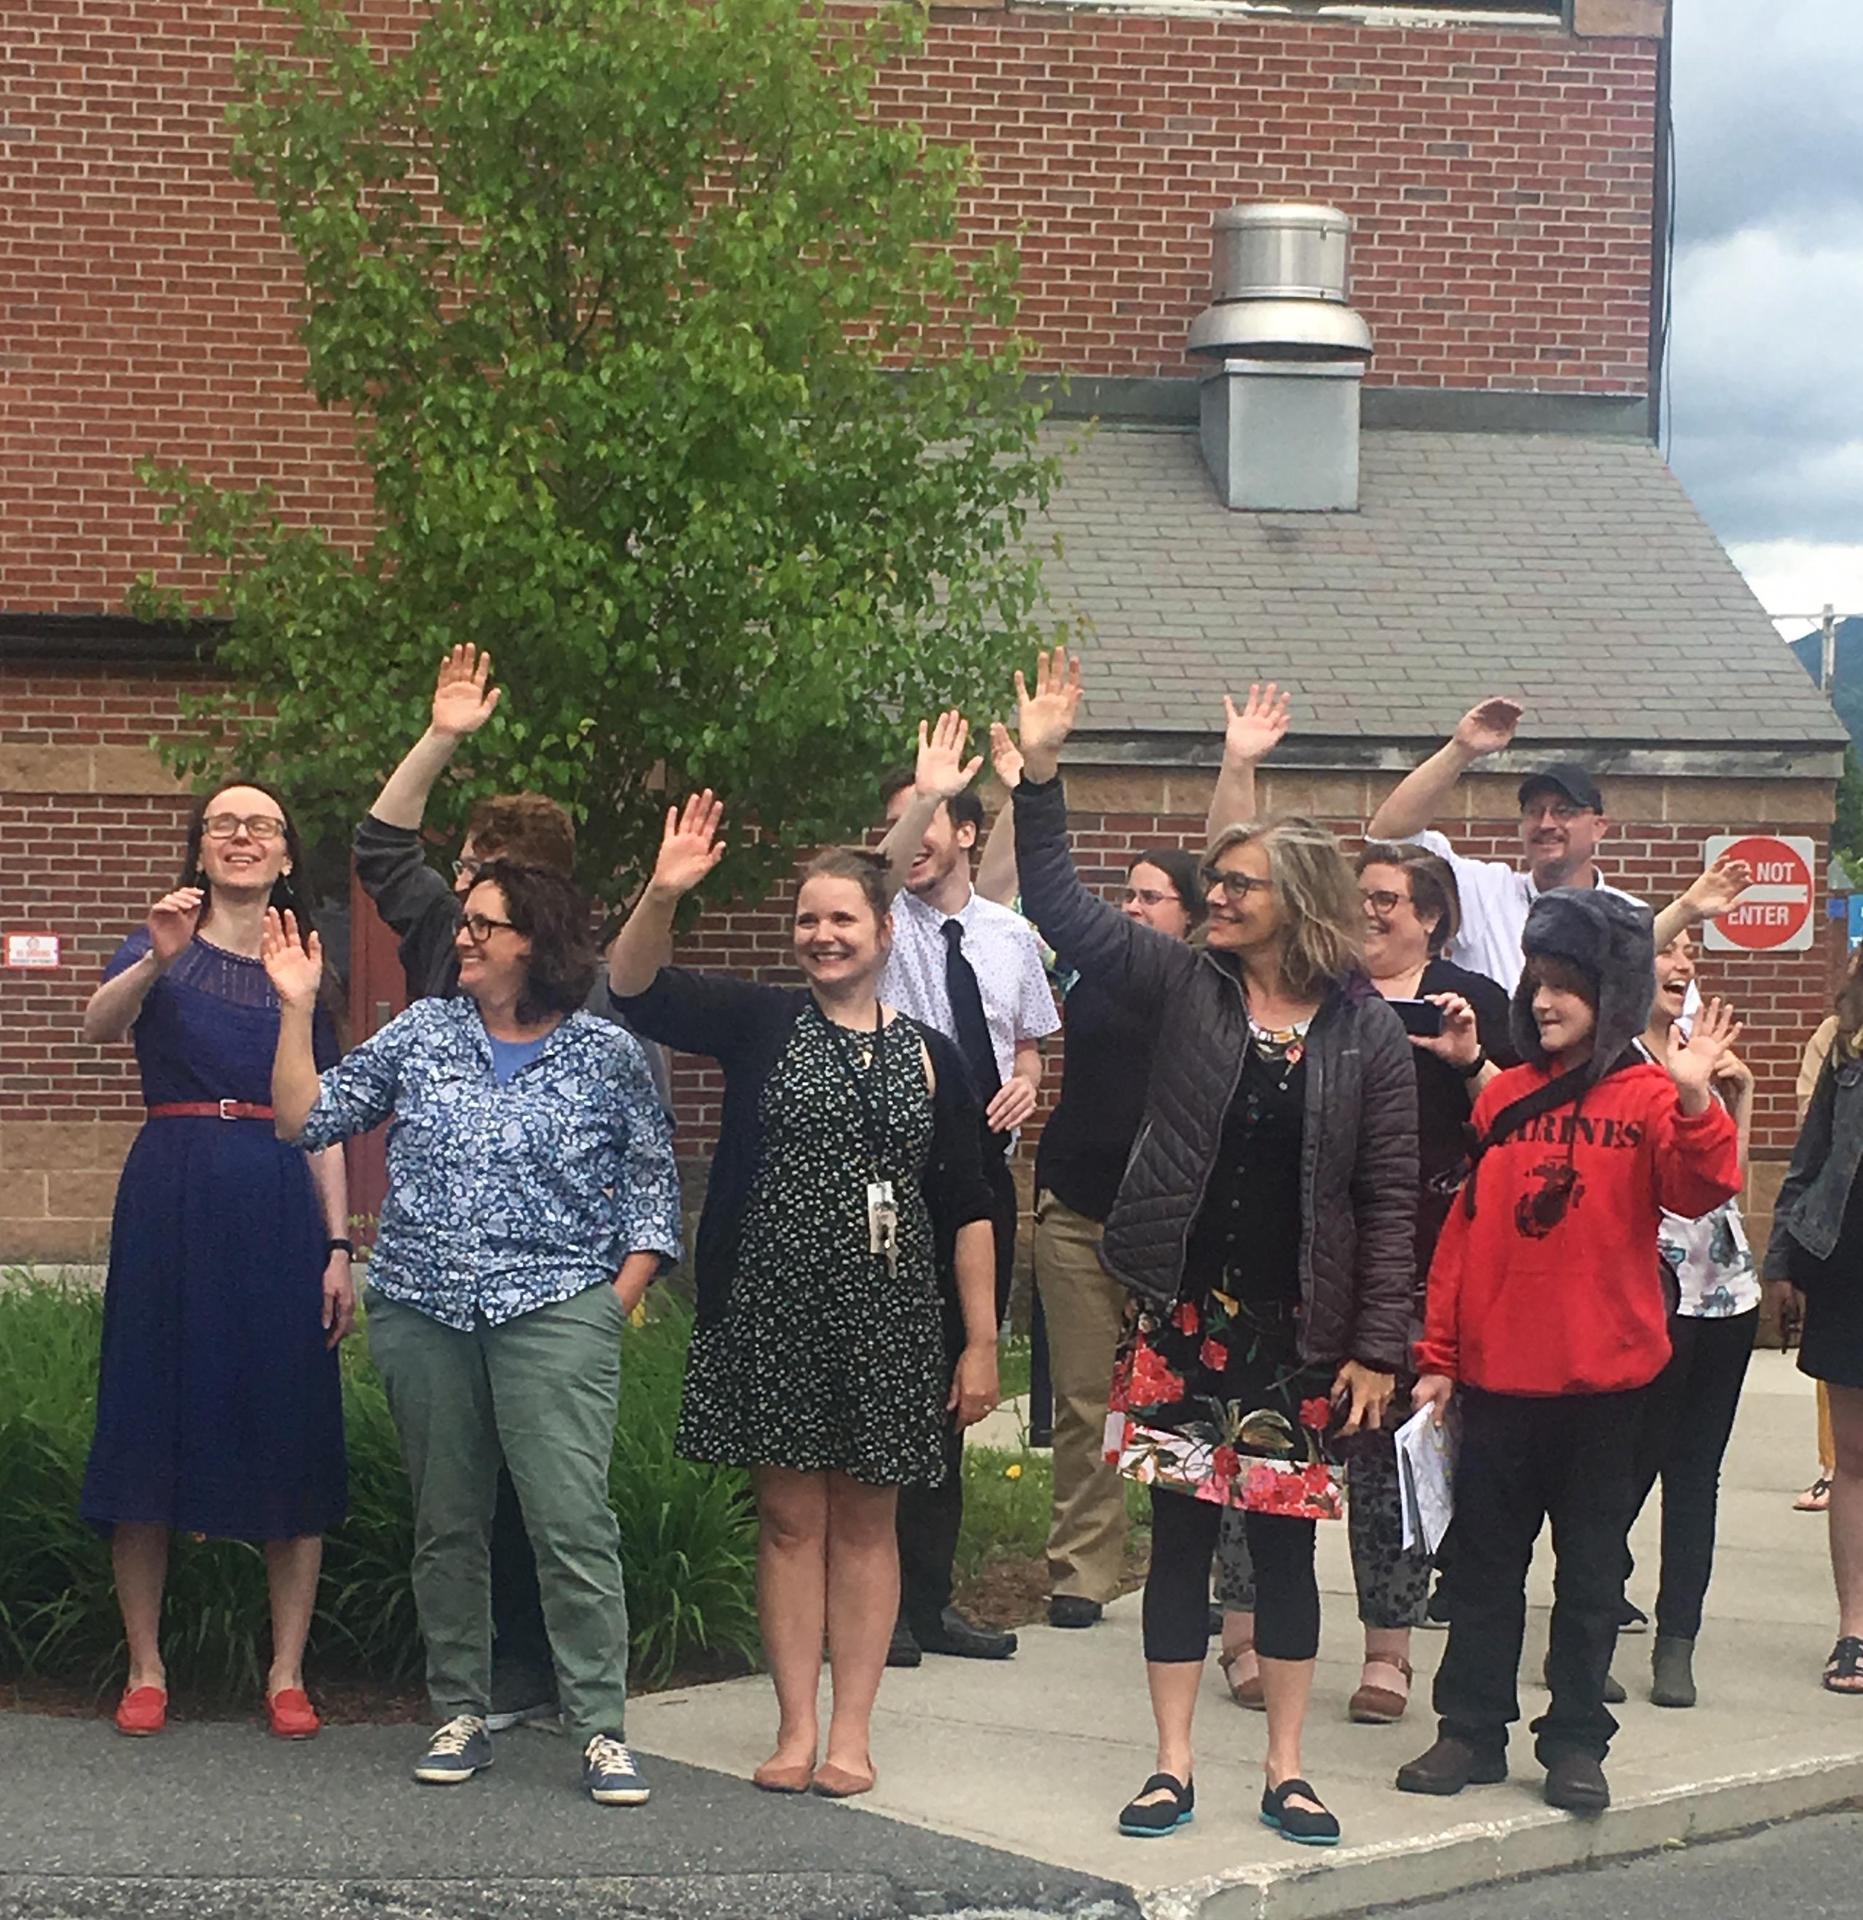 Teachers waving away buses